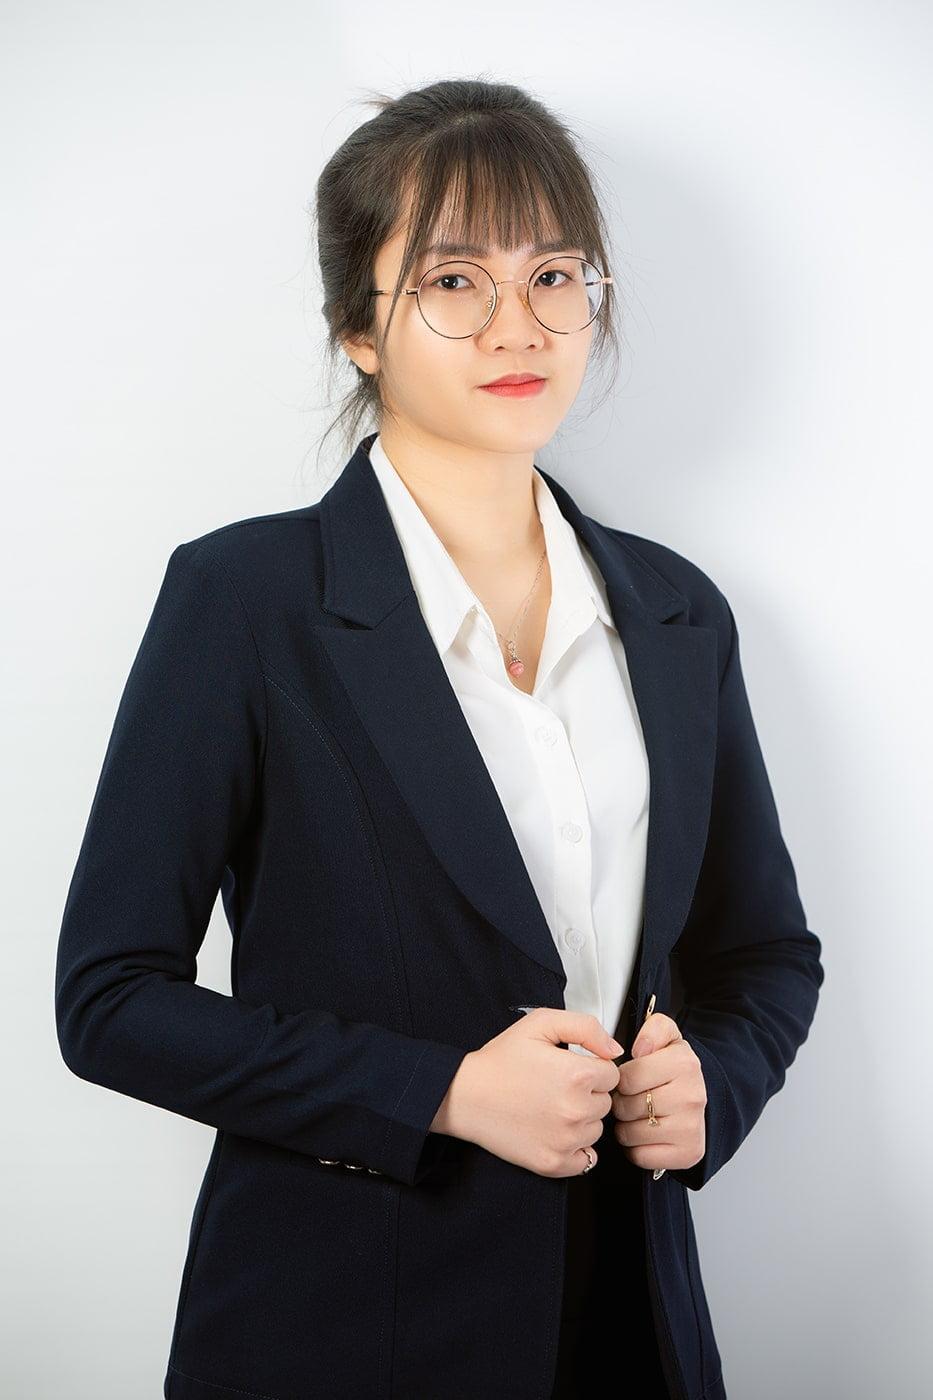 Profile cong ty 15 - Album chụp ảnh profile công ty Luật Dzungsrt Law - HThao Studio